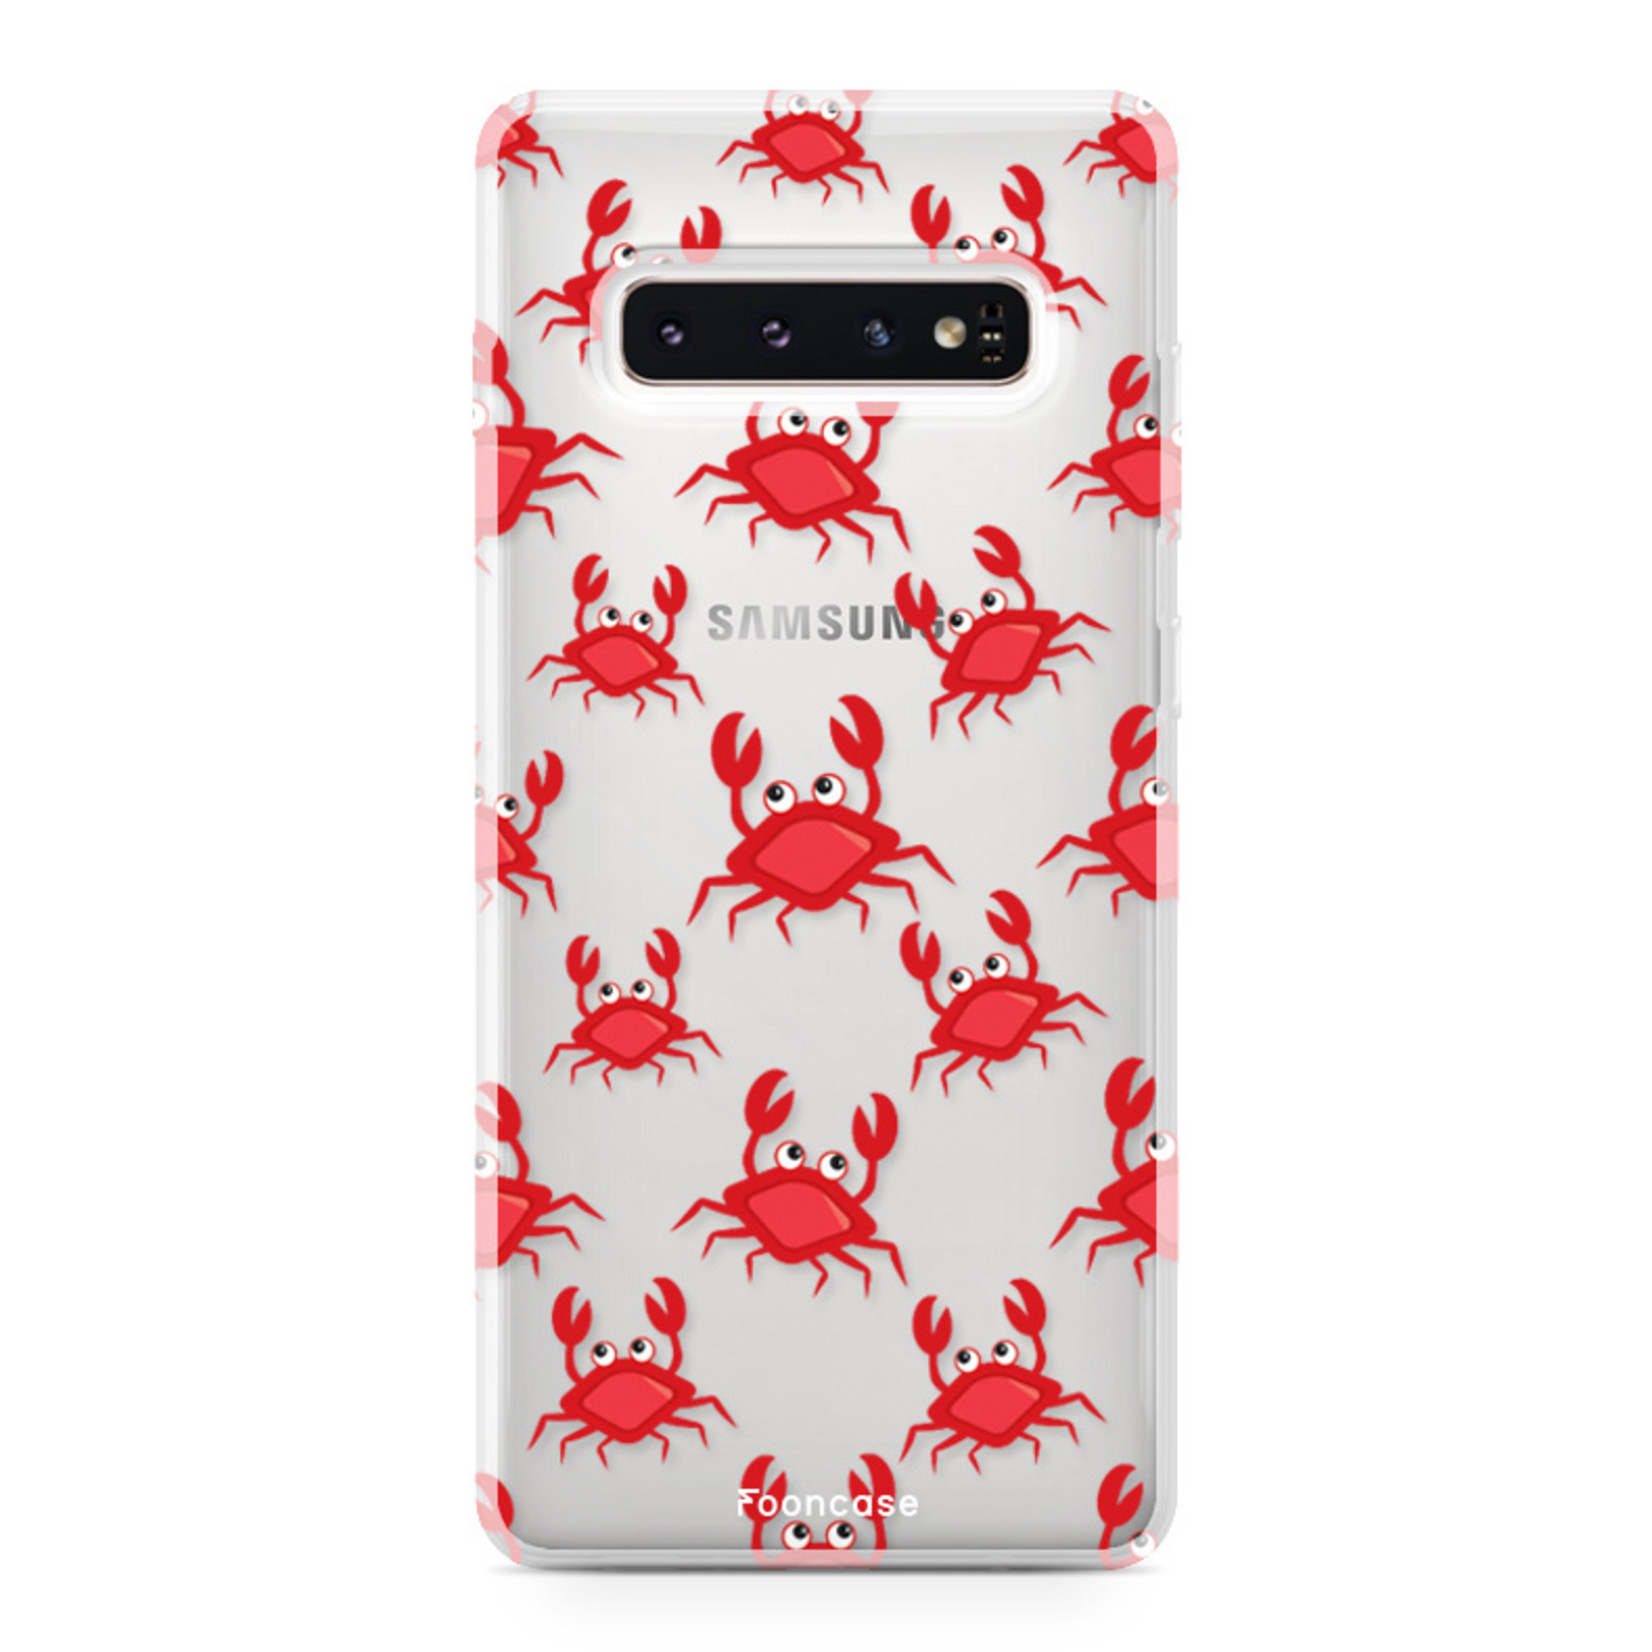 FOONCASE Samsung Galaxy S10 Plus hoesje TPU Soft Case - Back Cover - Crabs / Krabbetjes / Krabben